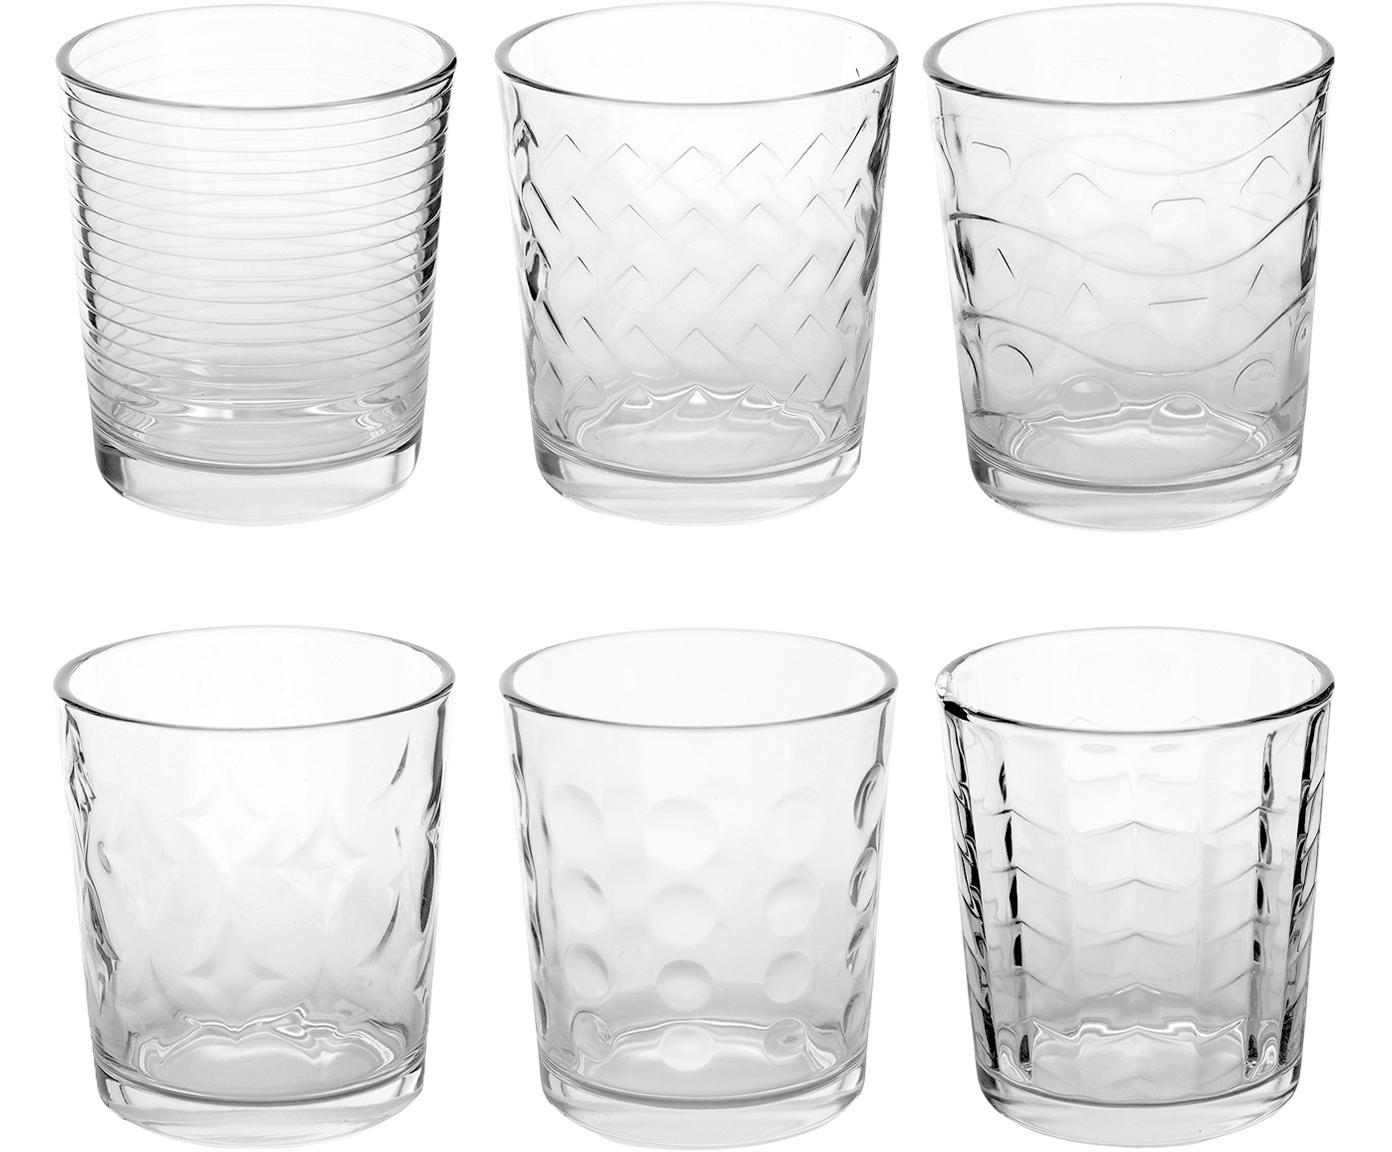 Vasos con relieve Clear, 6uds., Vidrio, Transparente, Ø 9 x Al 10 cm